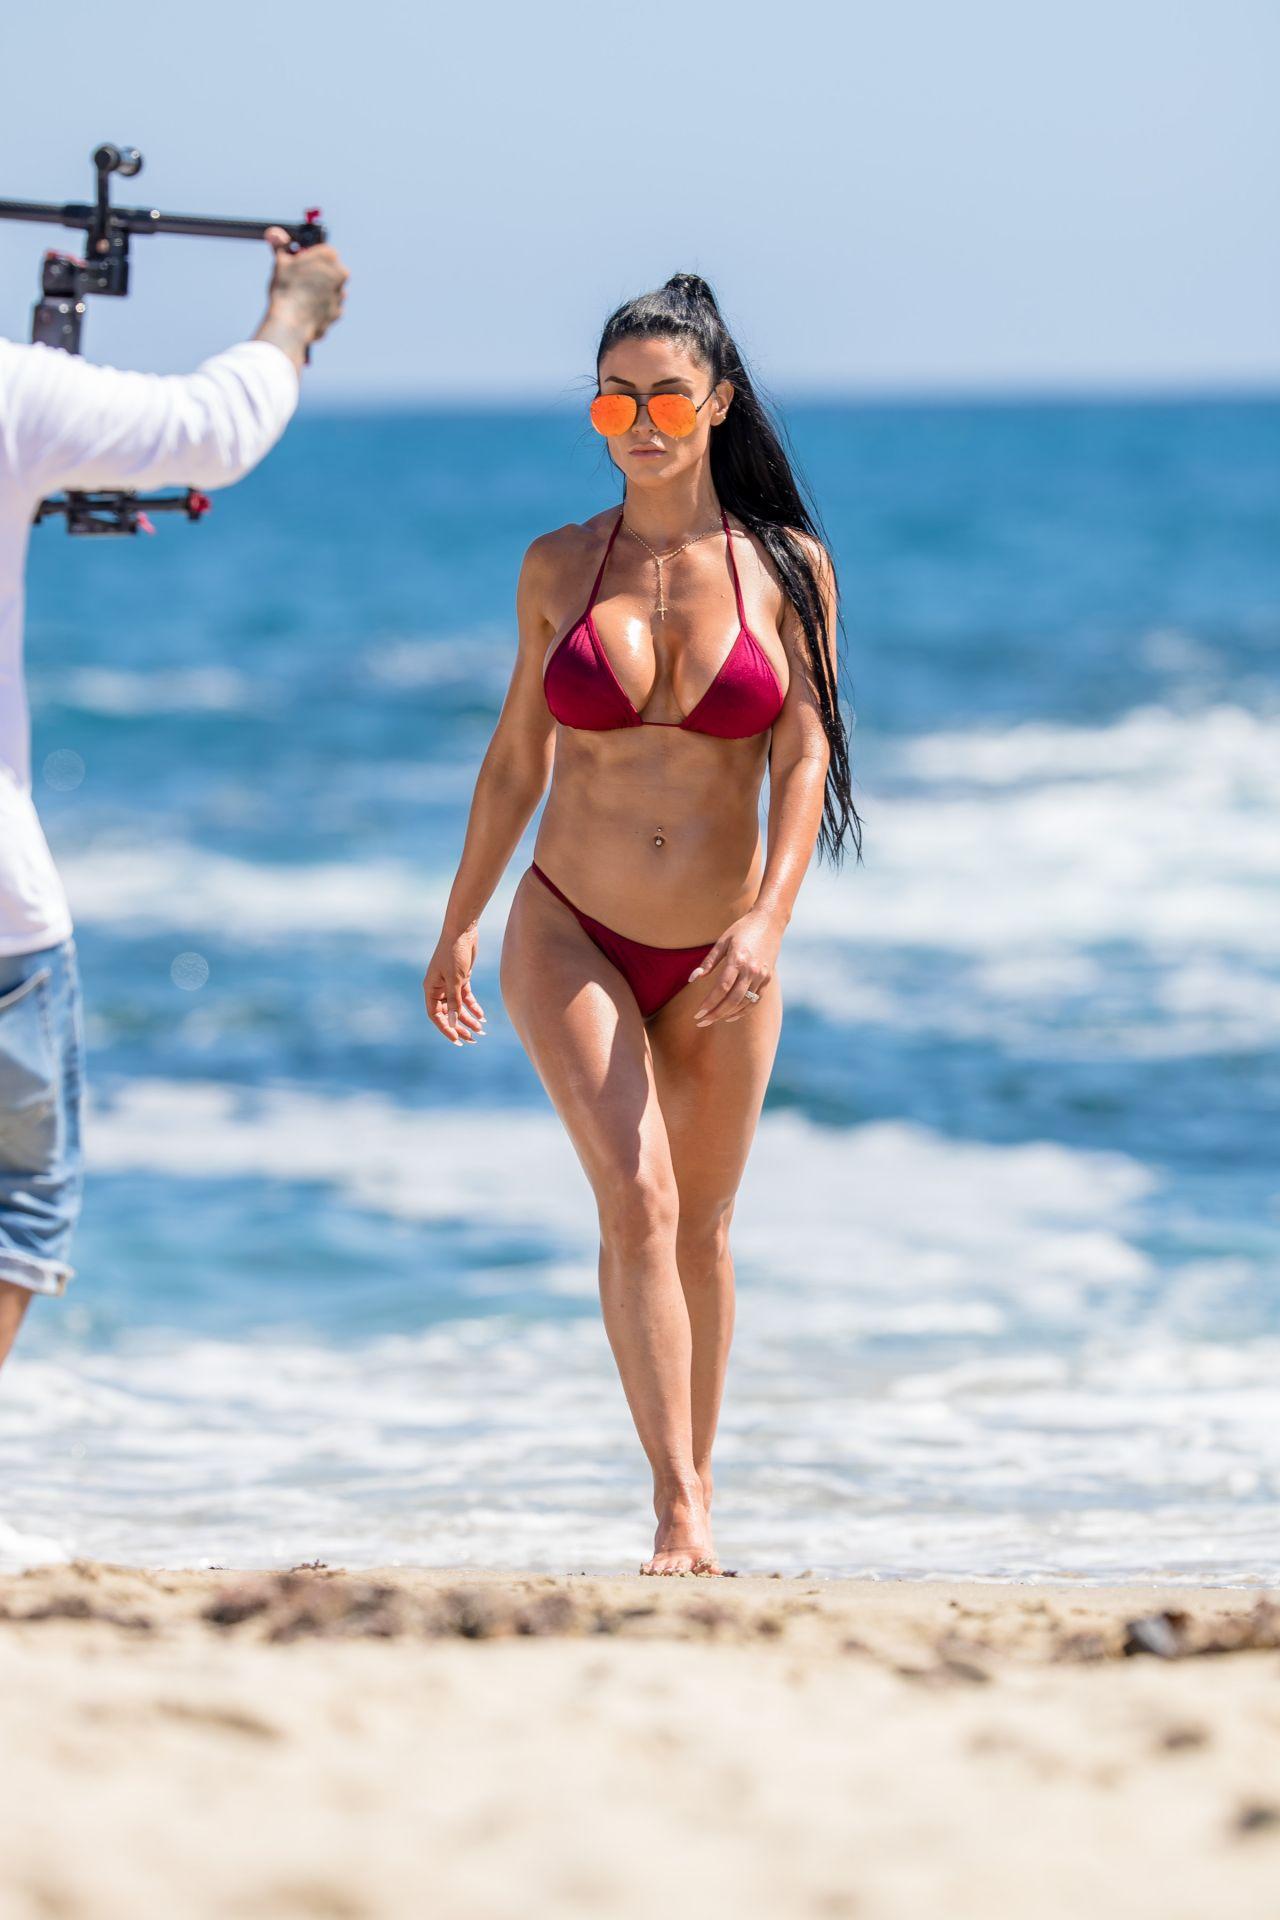 Eva marie bikini shoot behind the scenes 5